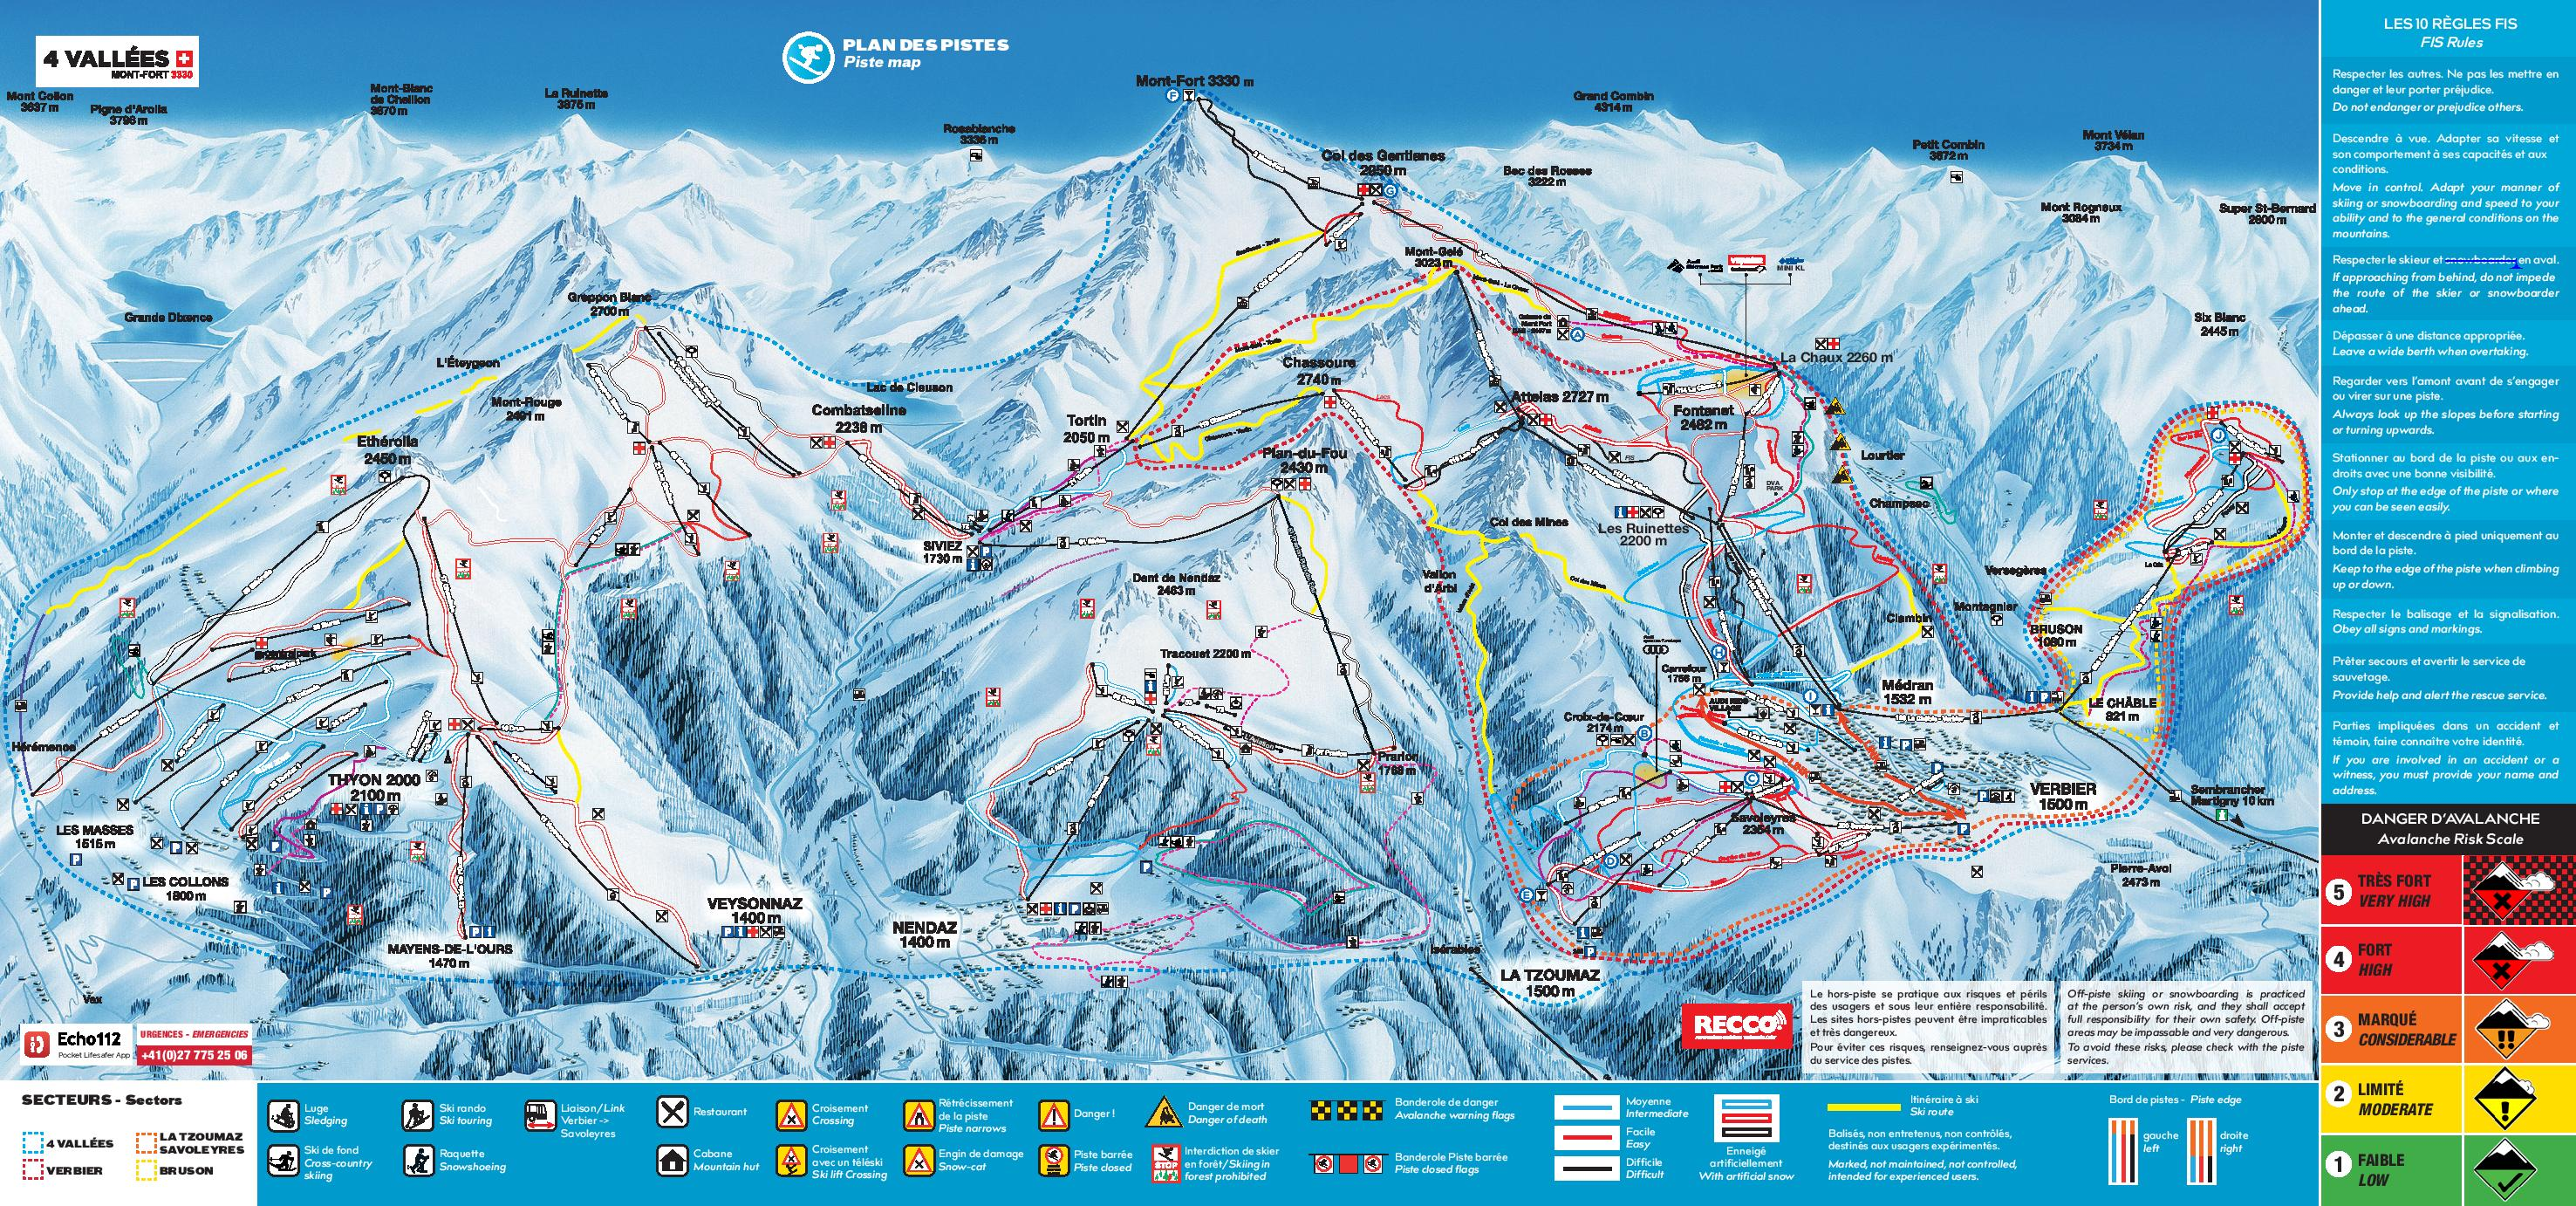 Verbier Trail Map